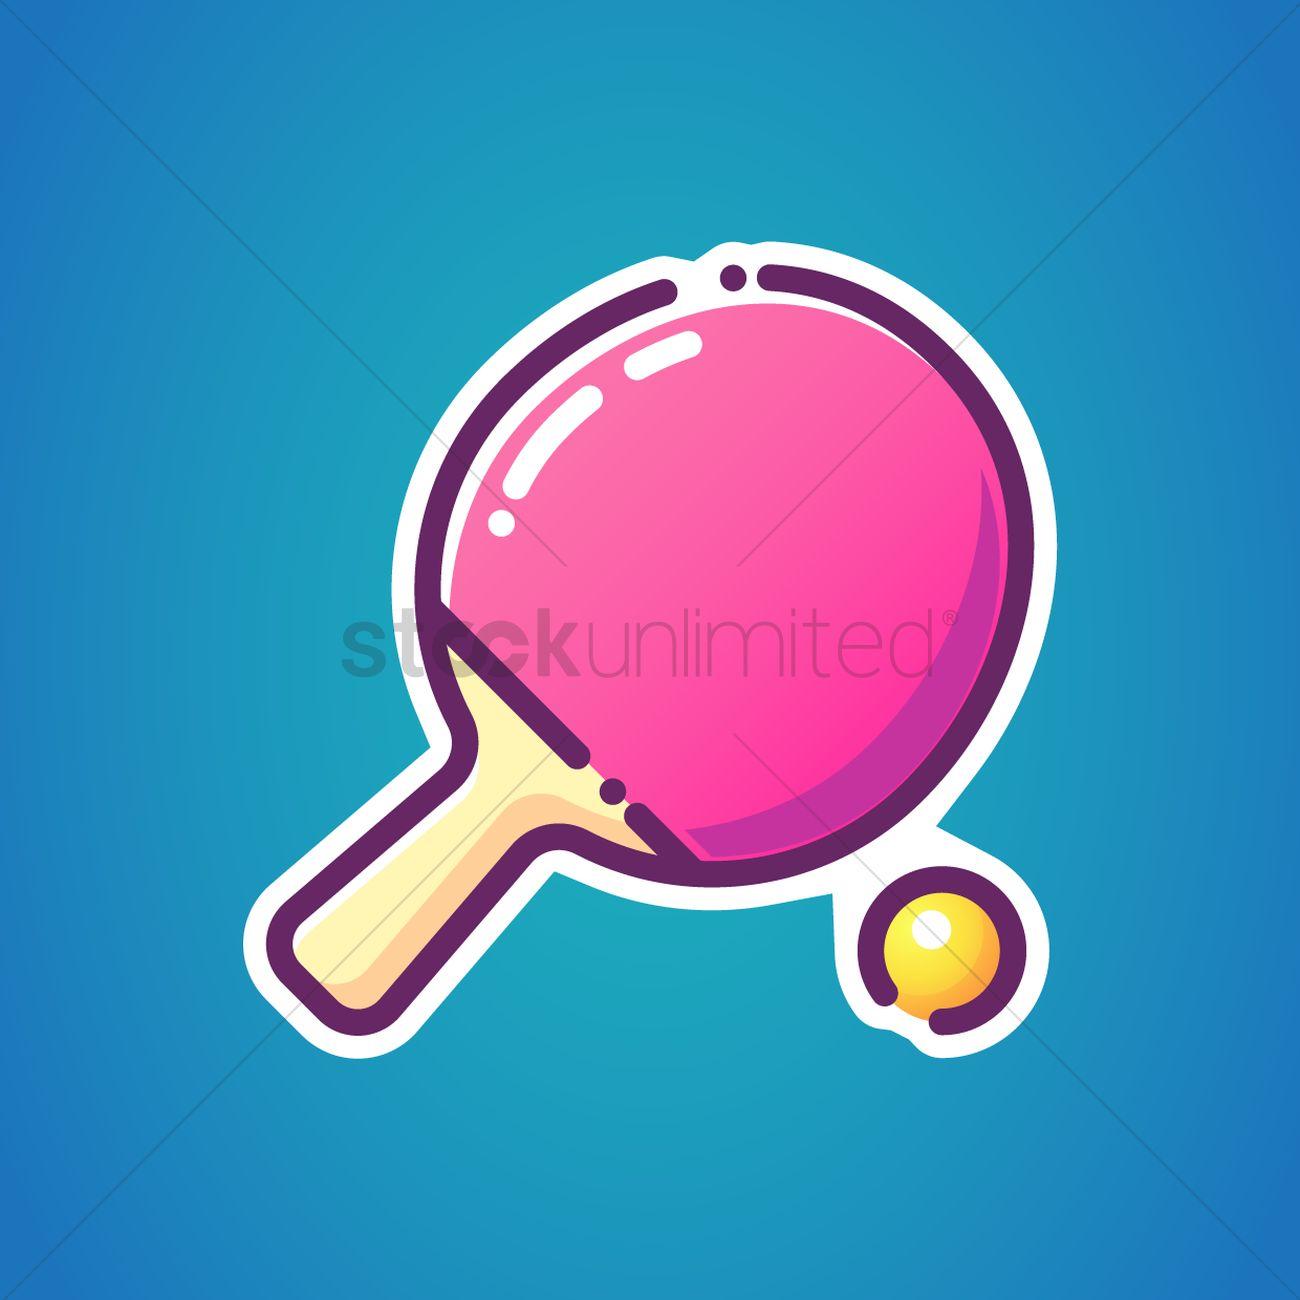 Table tennis bat and ball Vector Image - 2026939